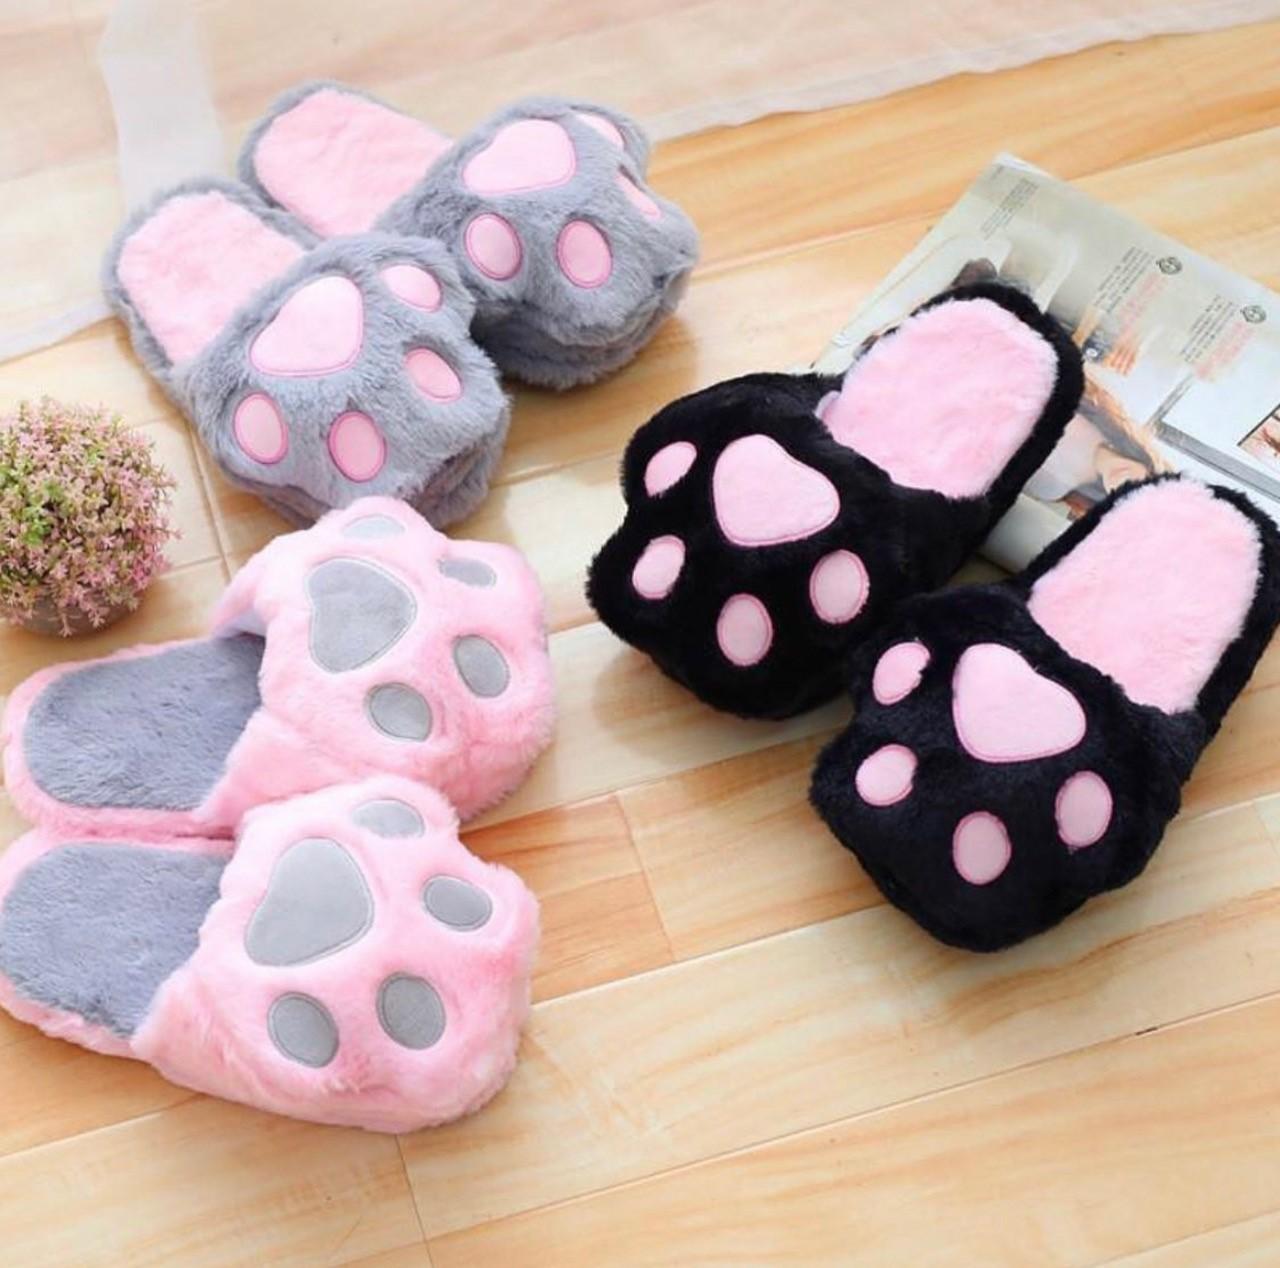 Kawaii Neko Cat Paw Slippers – Special Edition